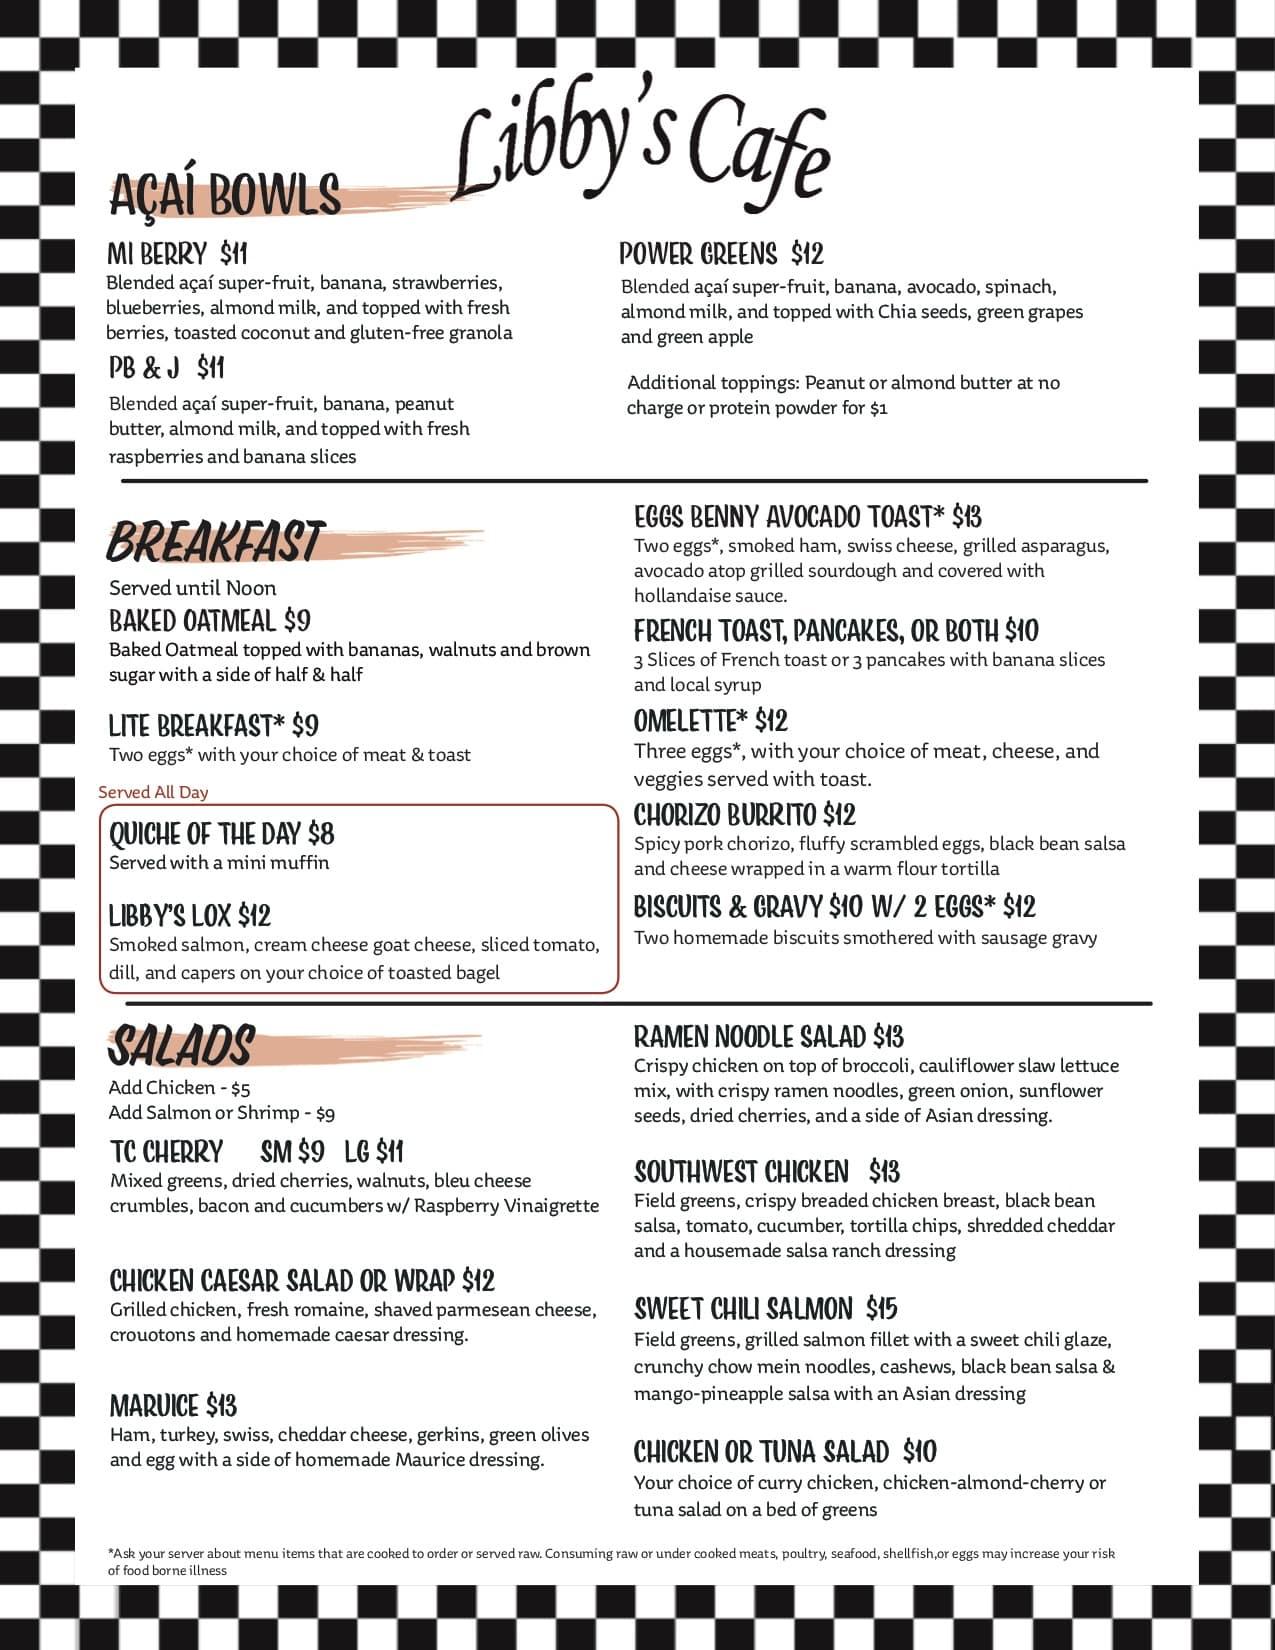 Libbys cafe menu at Fernelius Automotive